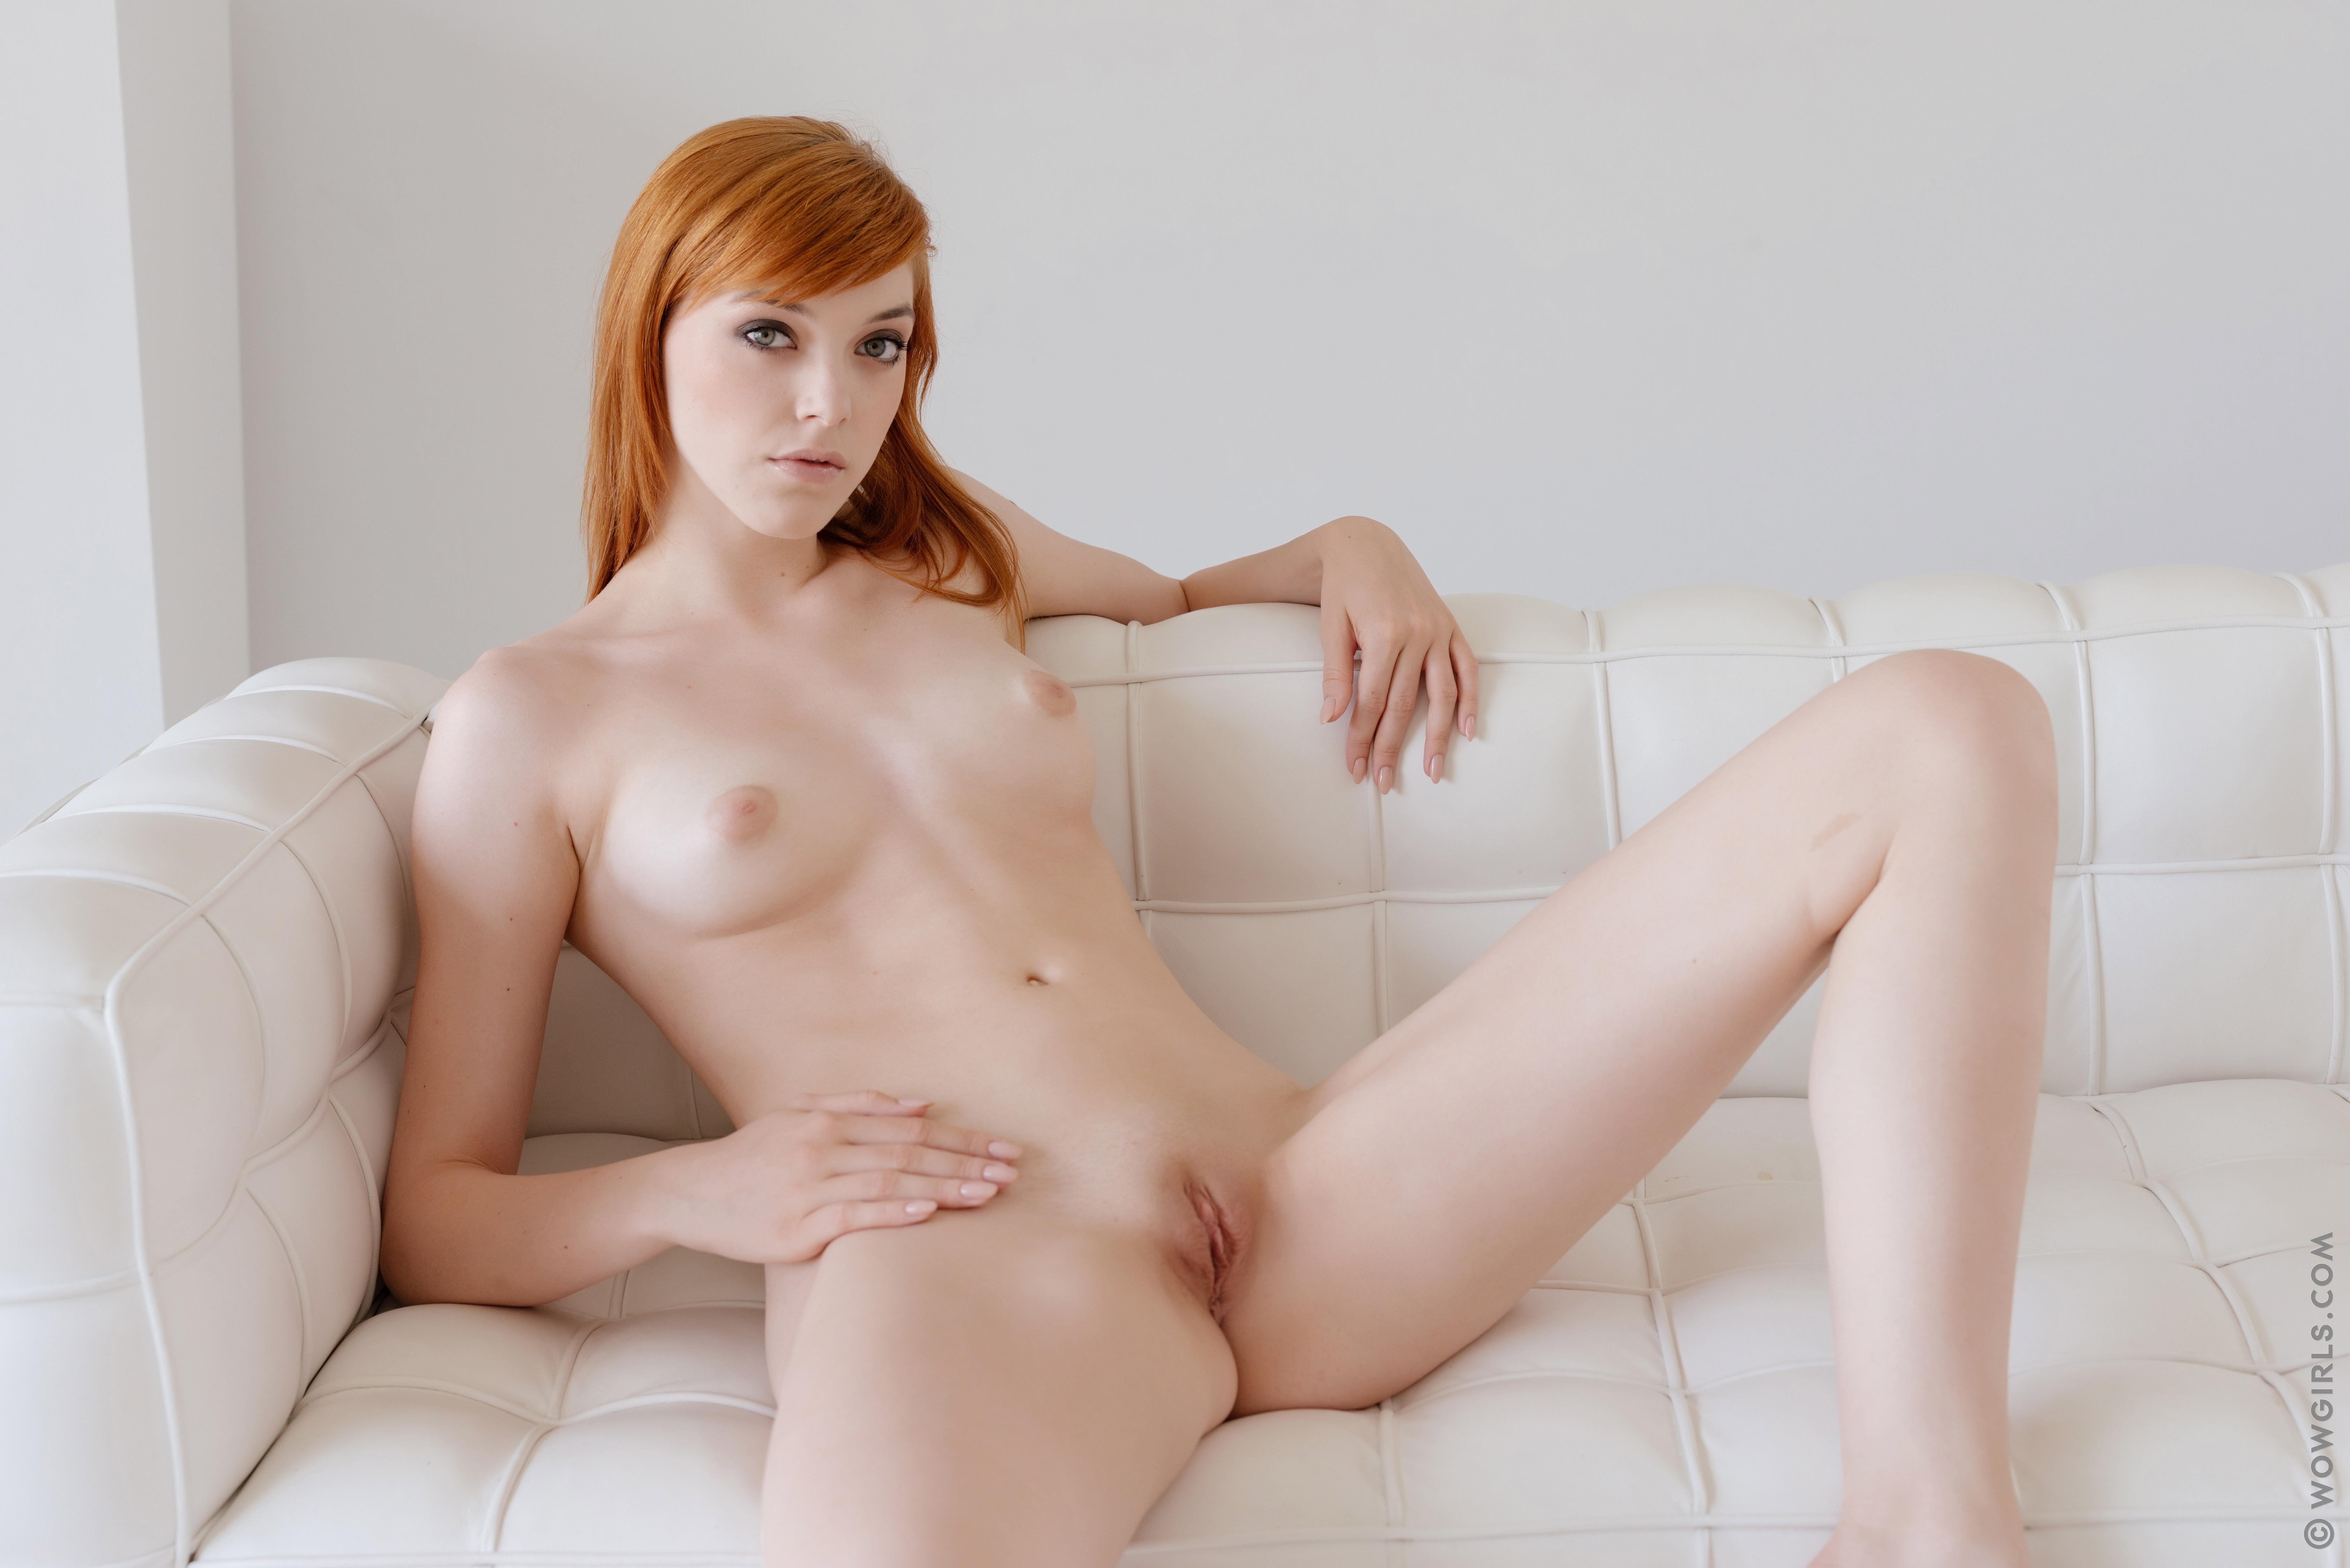 Anny aurora nude